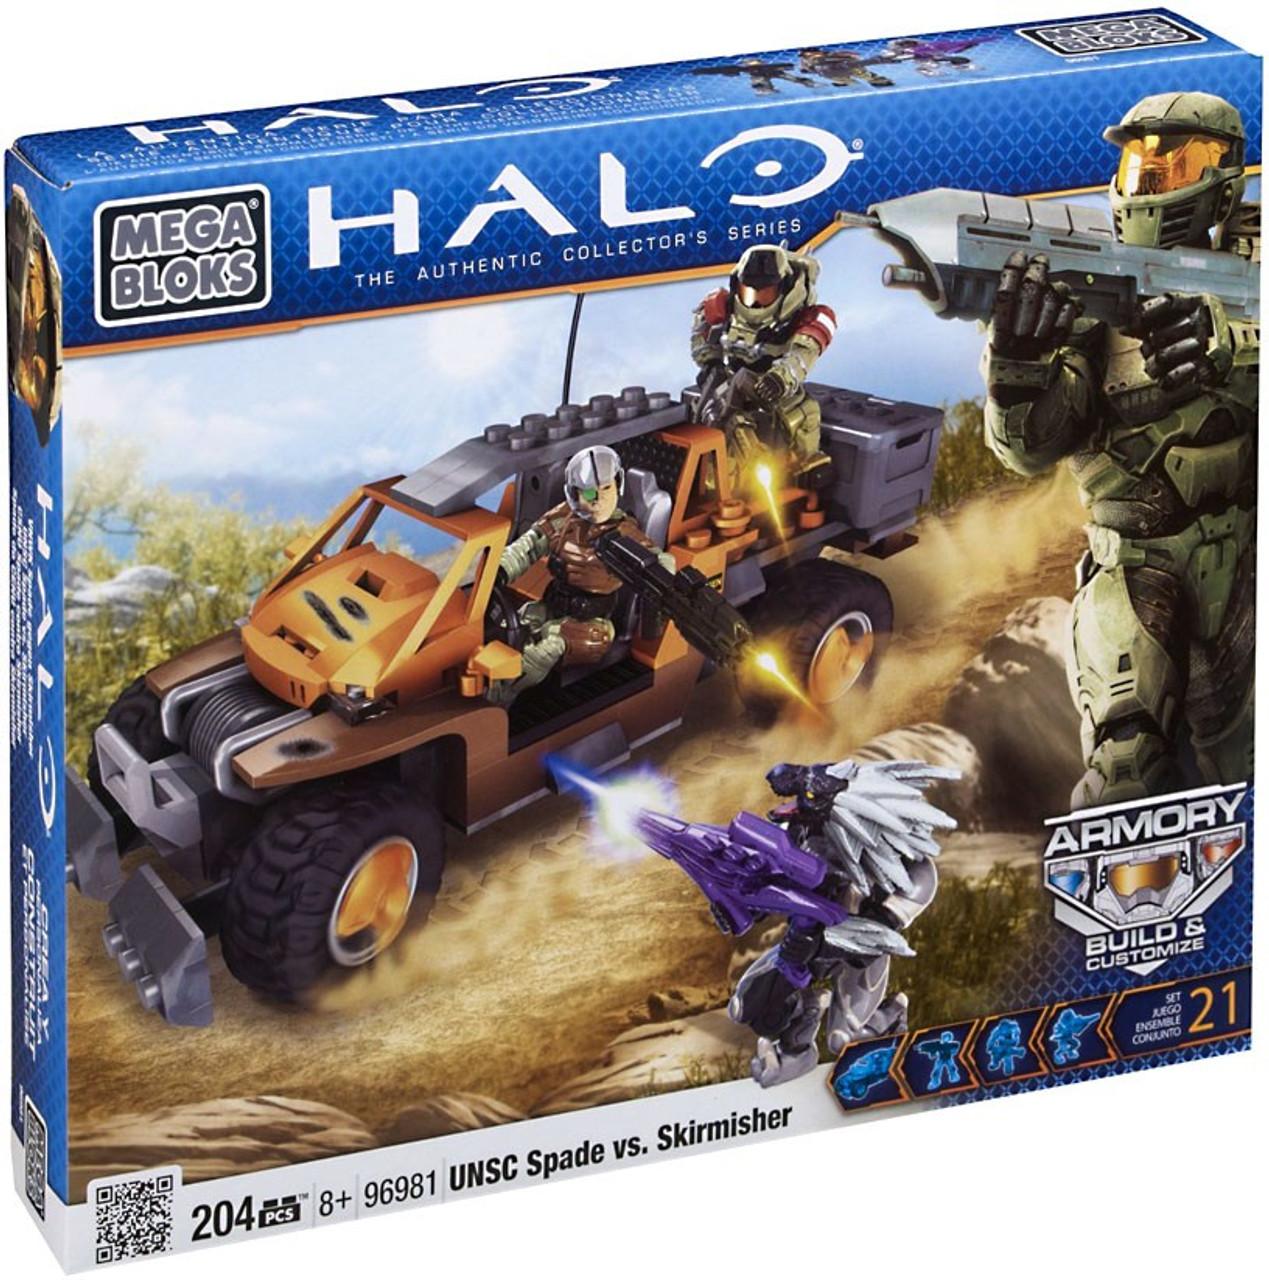 Mega Bloks Halo UNSC Spade vs. Skirmisher Set #96981